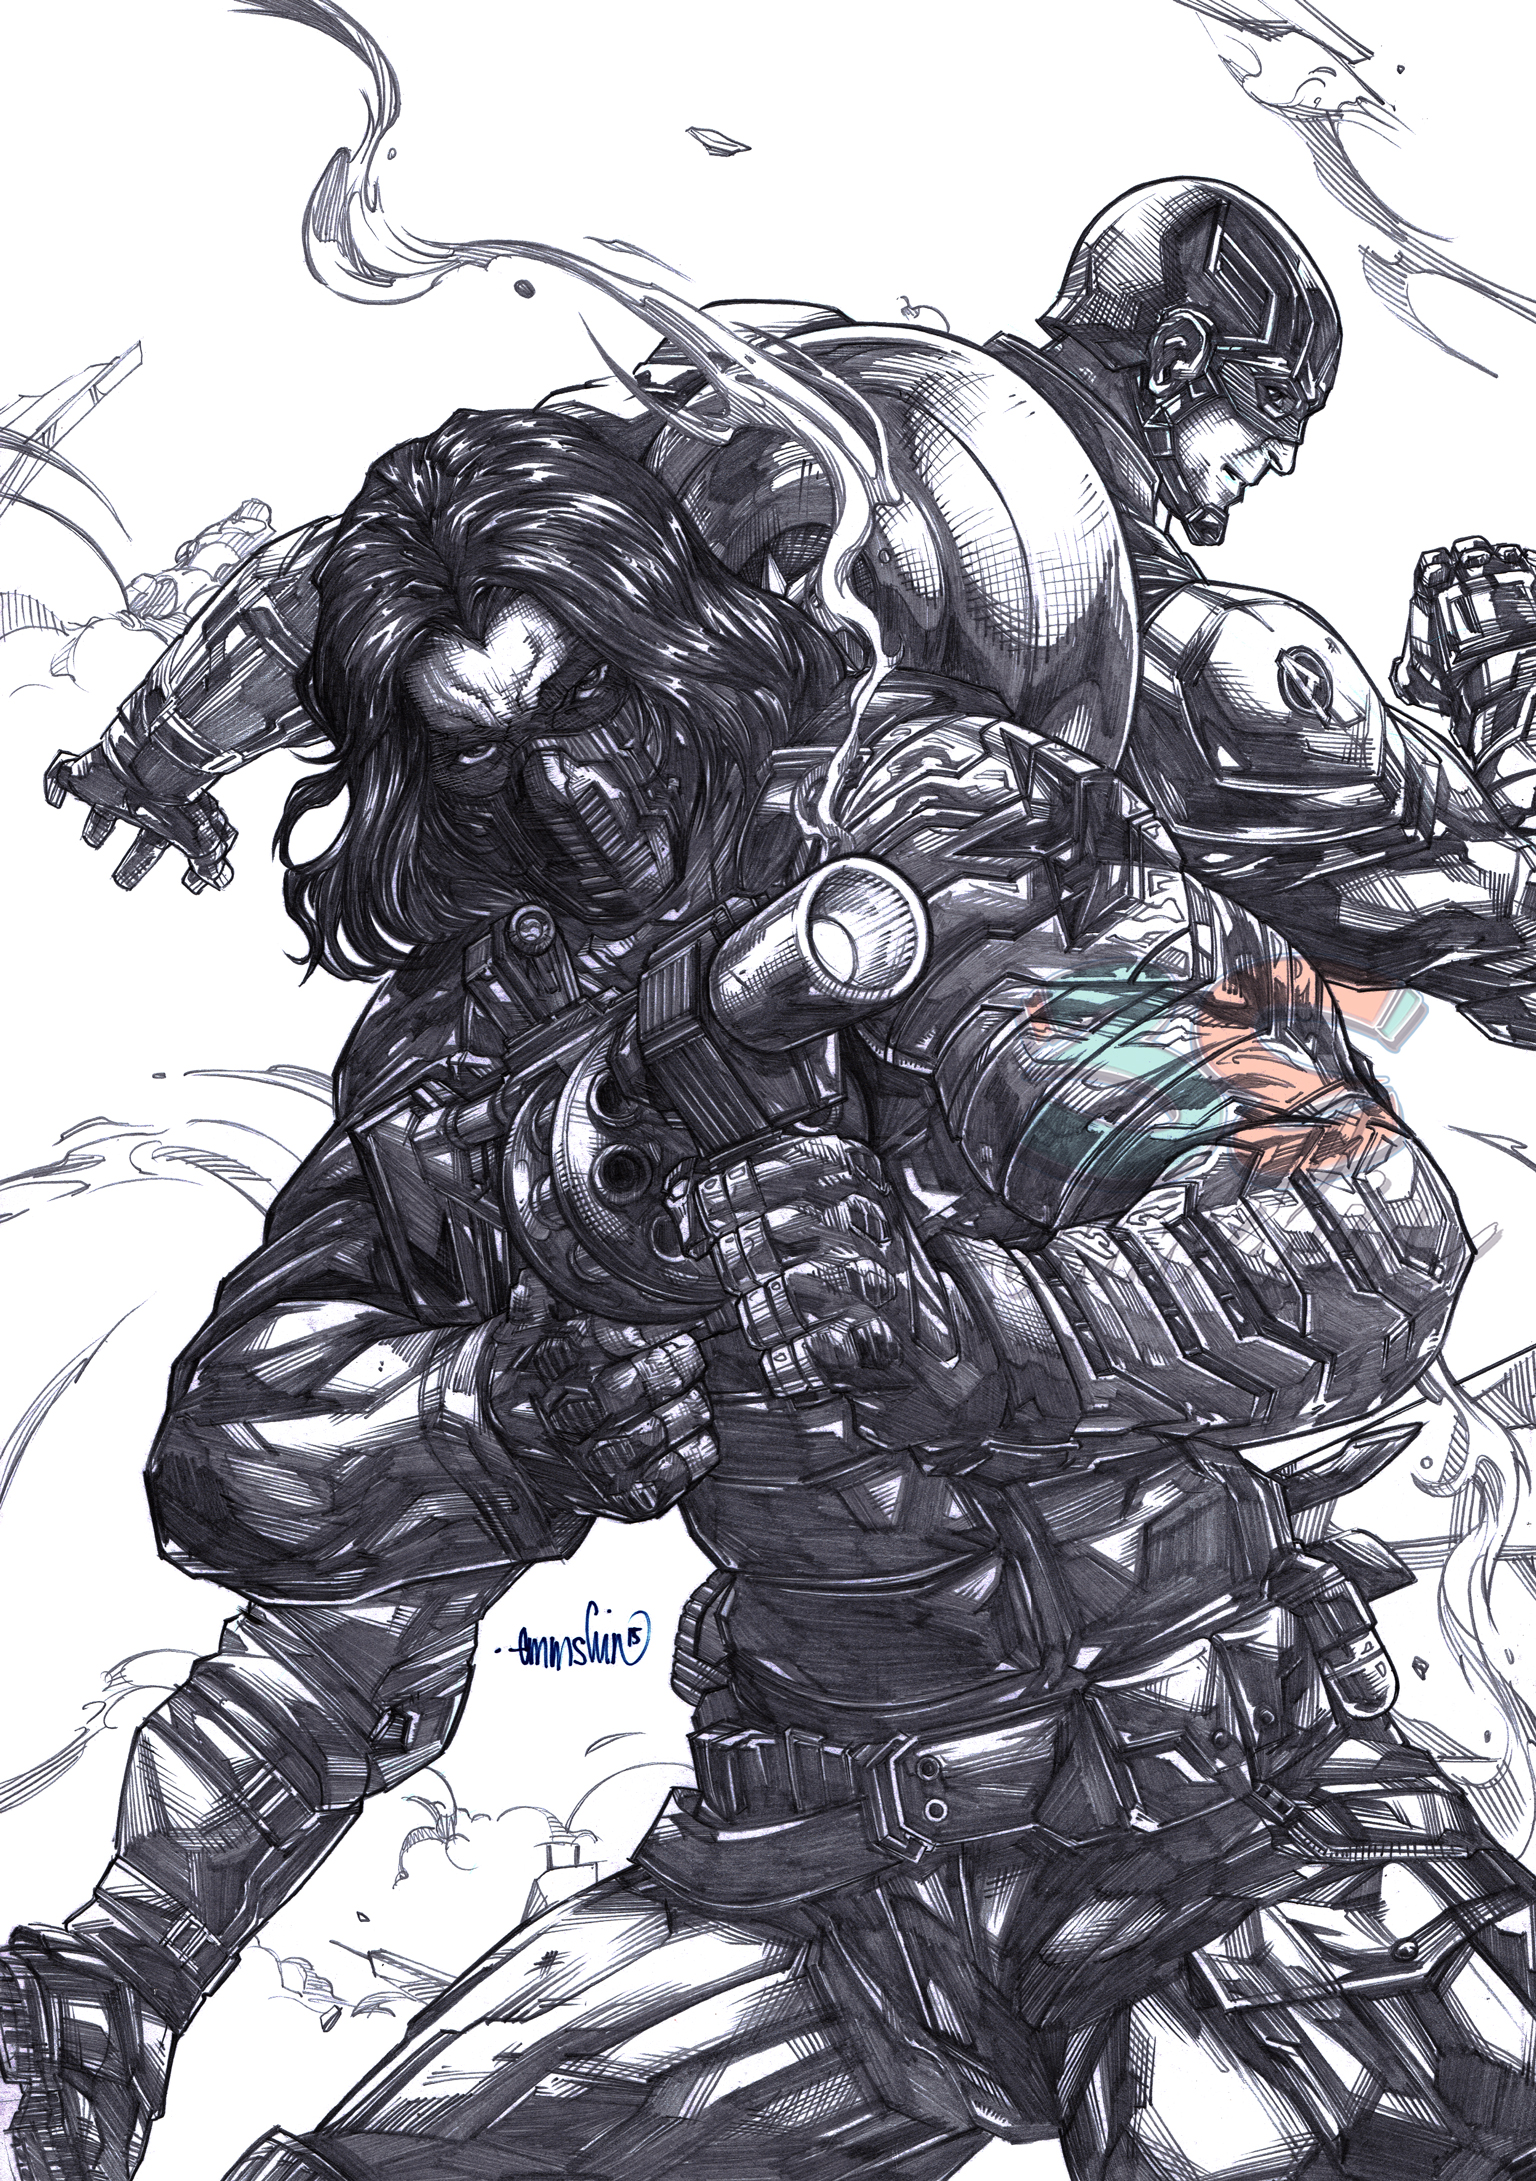 Winter Soldier (pencils) by emmshin on DeviantArt